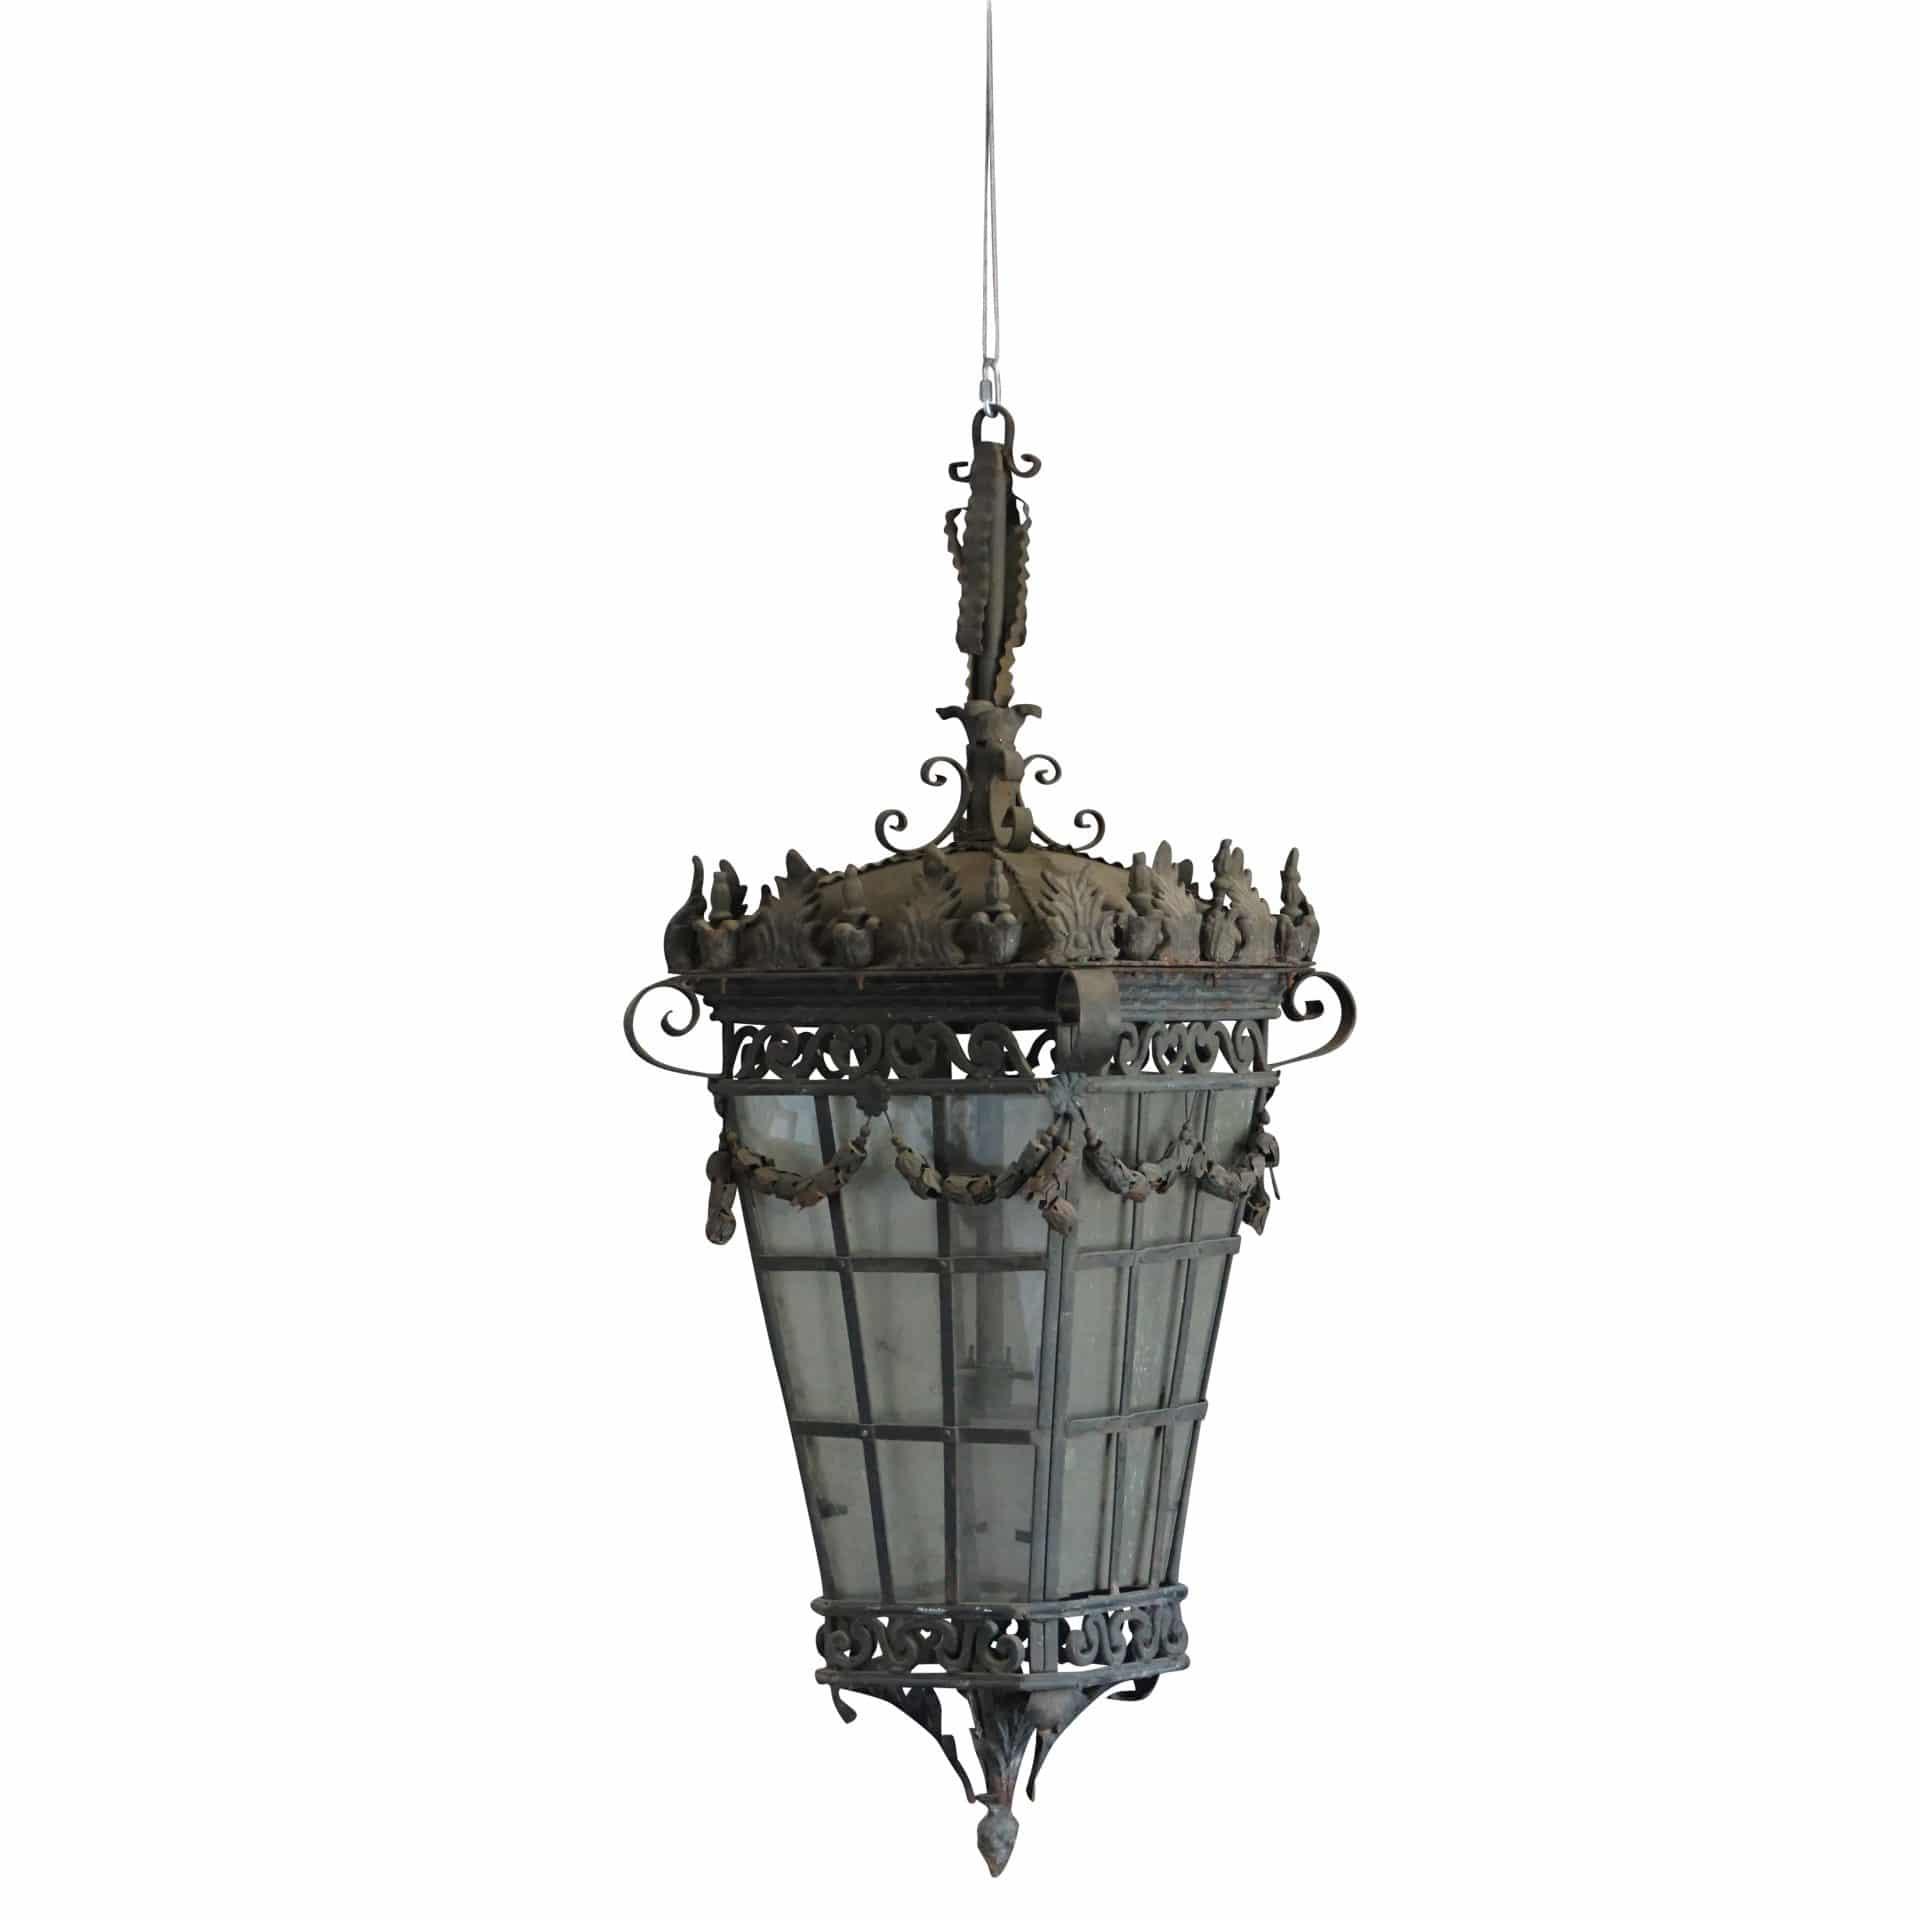 Pair of Monumental Parisian Lanterns